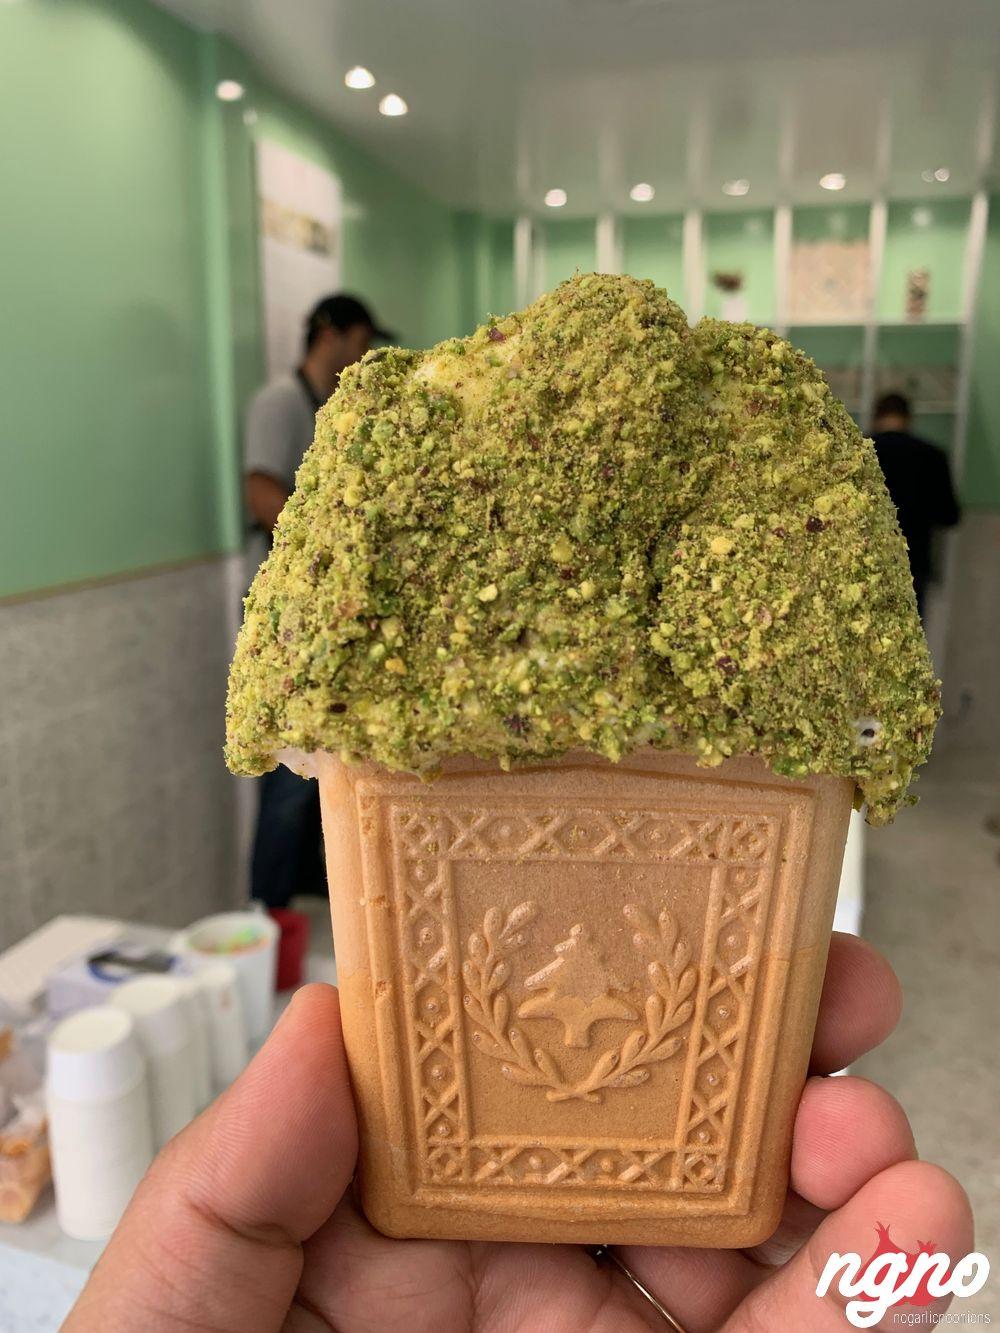 omisk-lebanese-ice-cream-paris-nogarlicnoonions-182019-04-17-06-36-46